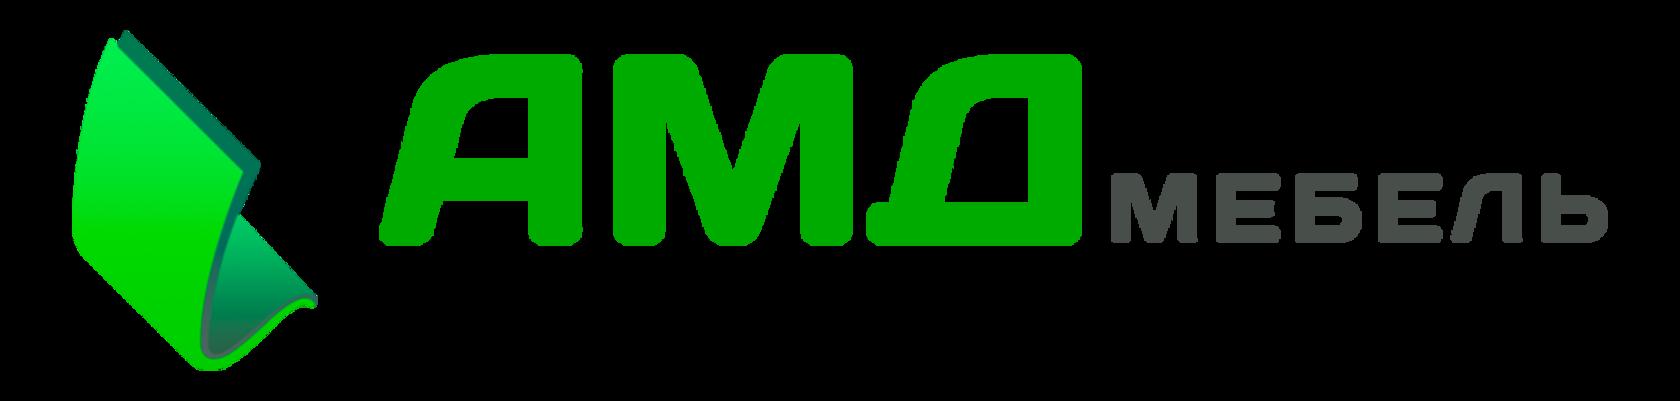 AMD-Style_mebel